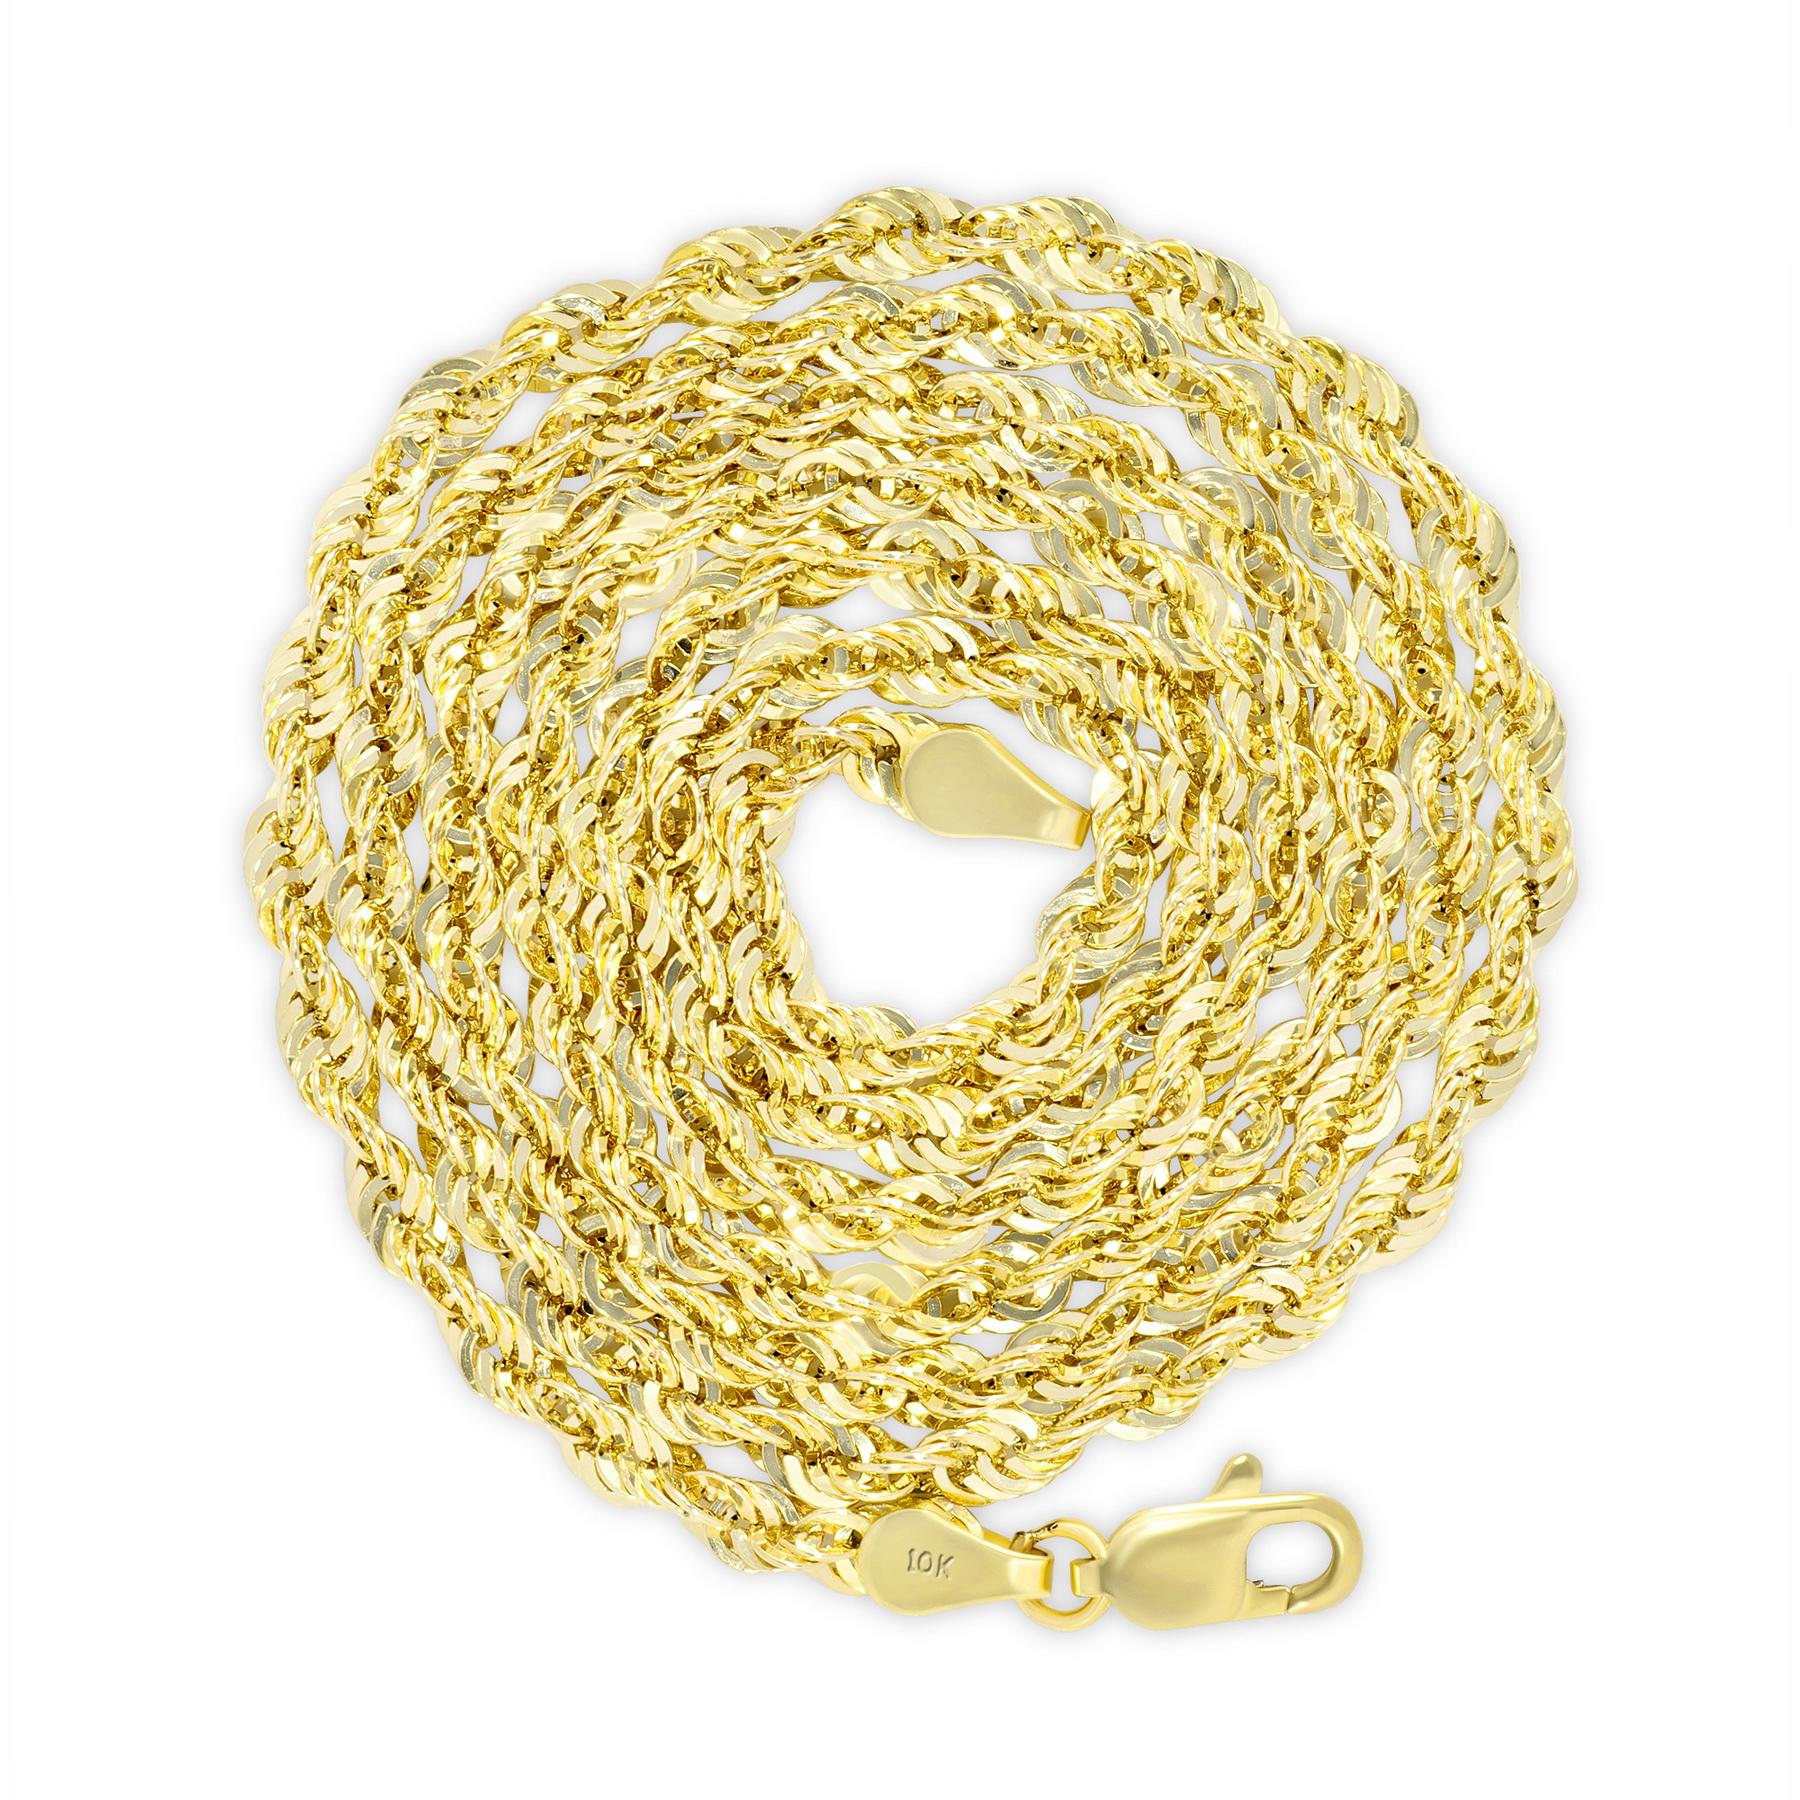 "10K Yellow Gold Light 1.5mm-4mm Diamond Cut Rope Chain Pendant Necklace 14""- 30"" 10"